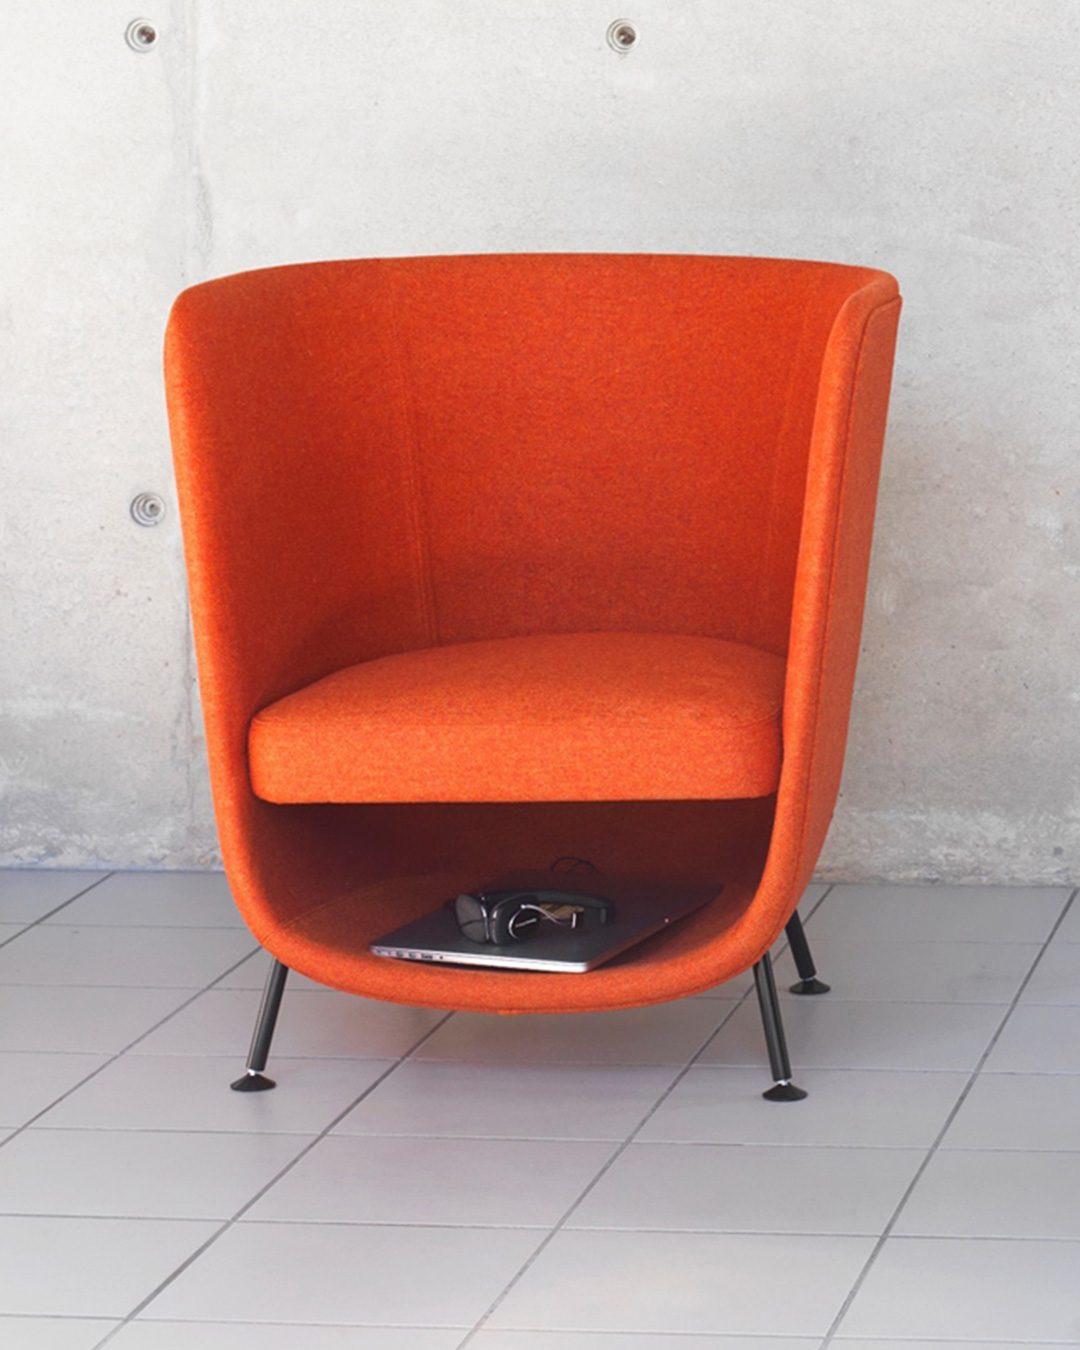 sillon pocket chair de color naranja